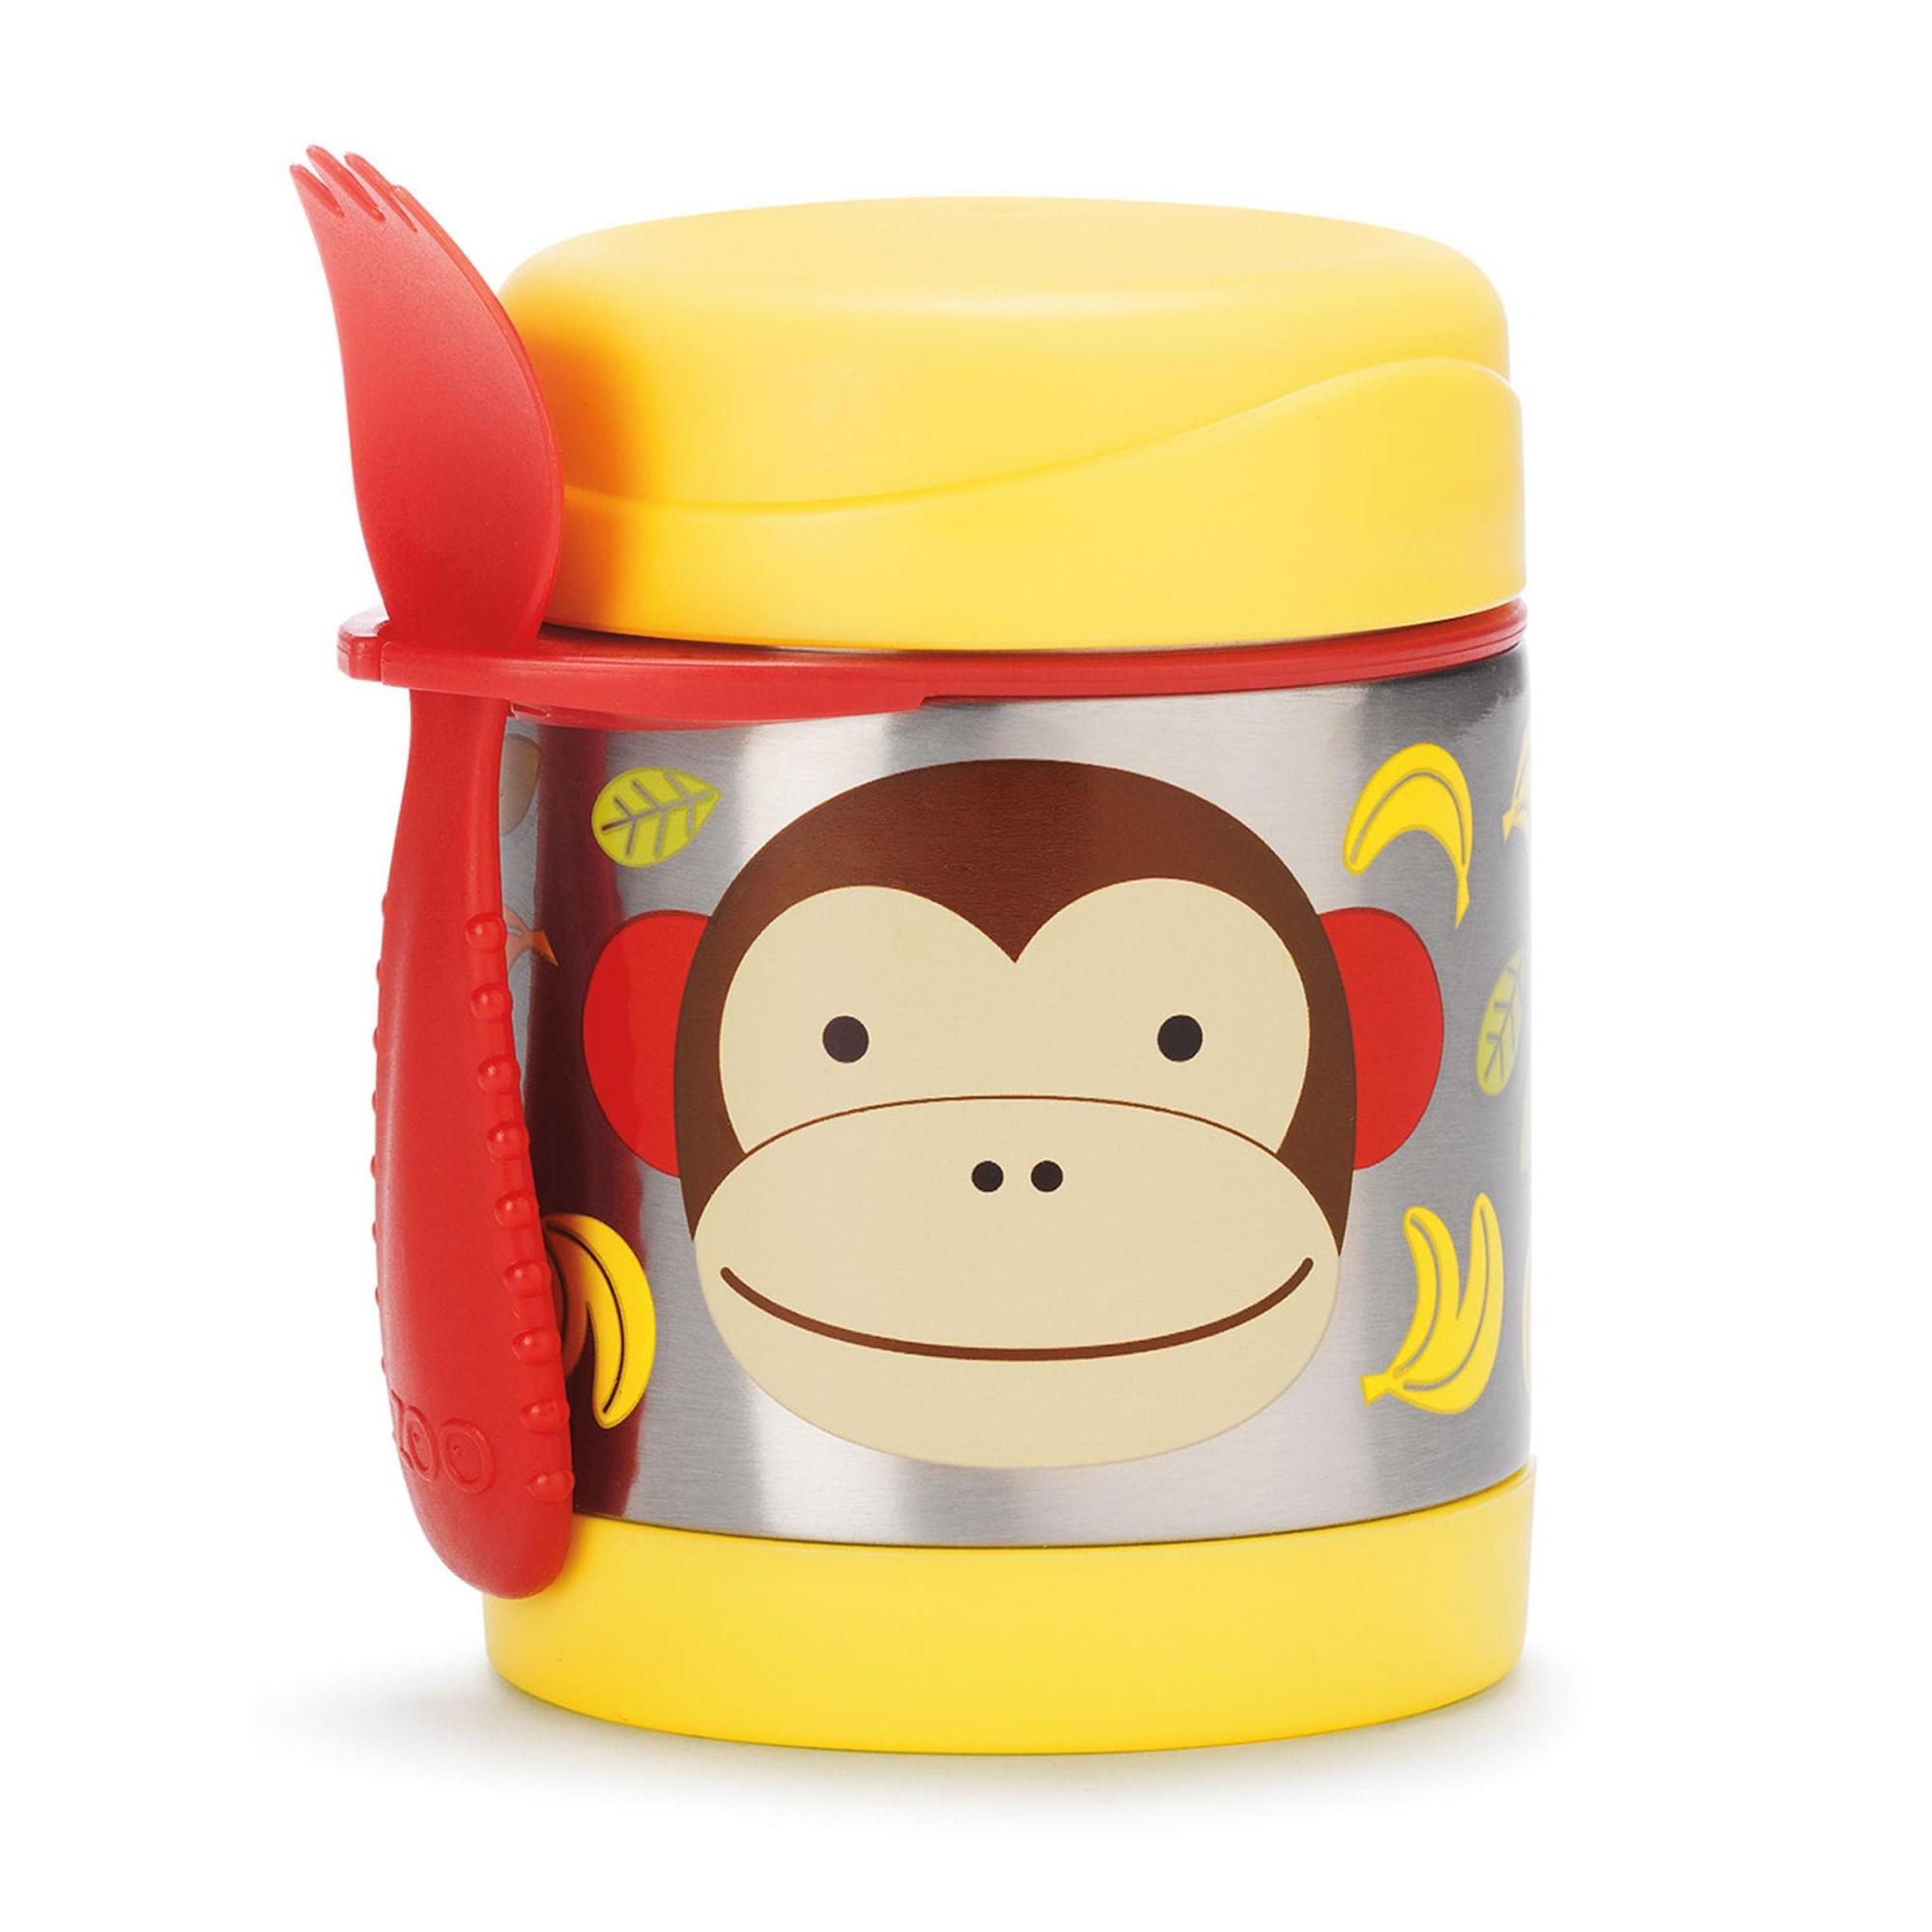 Pote térmico Skip Hop - Macaco